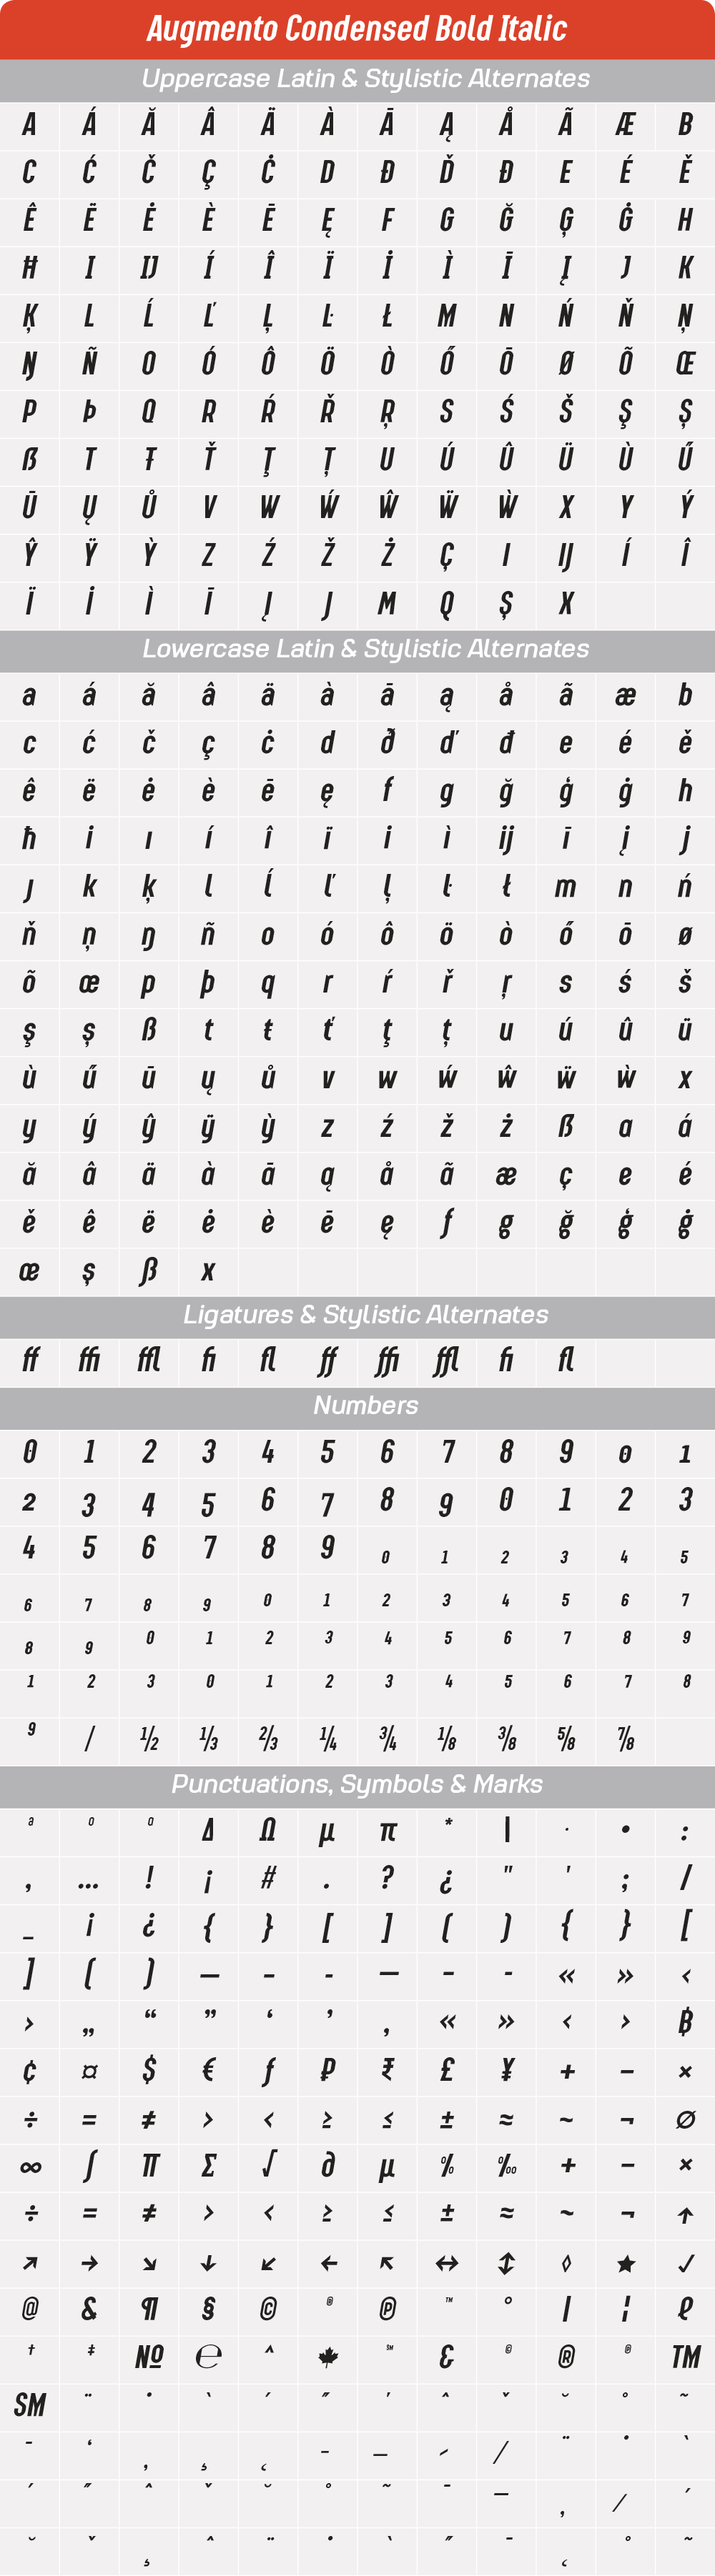 Condensed Bold ItalicAugmento-GlyphTable.png